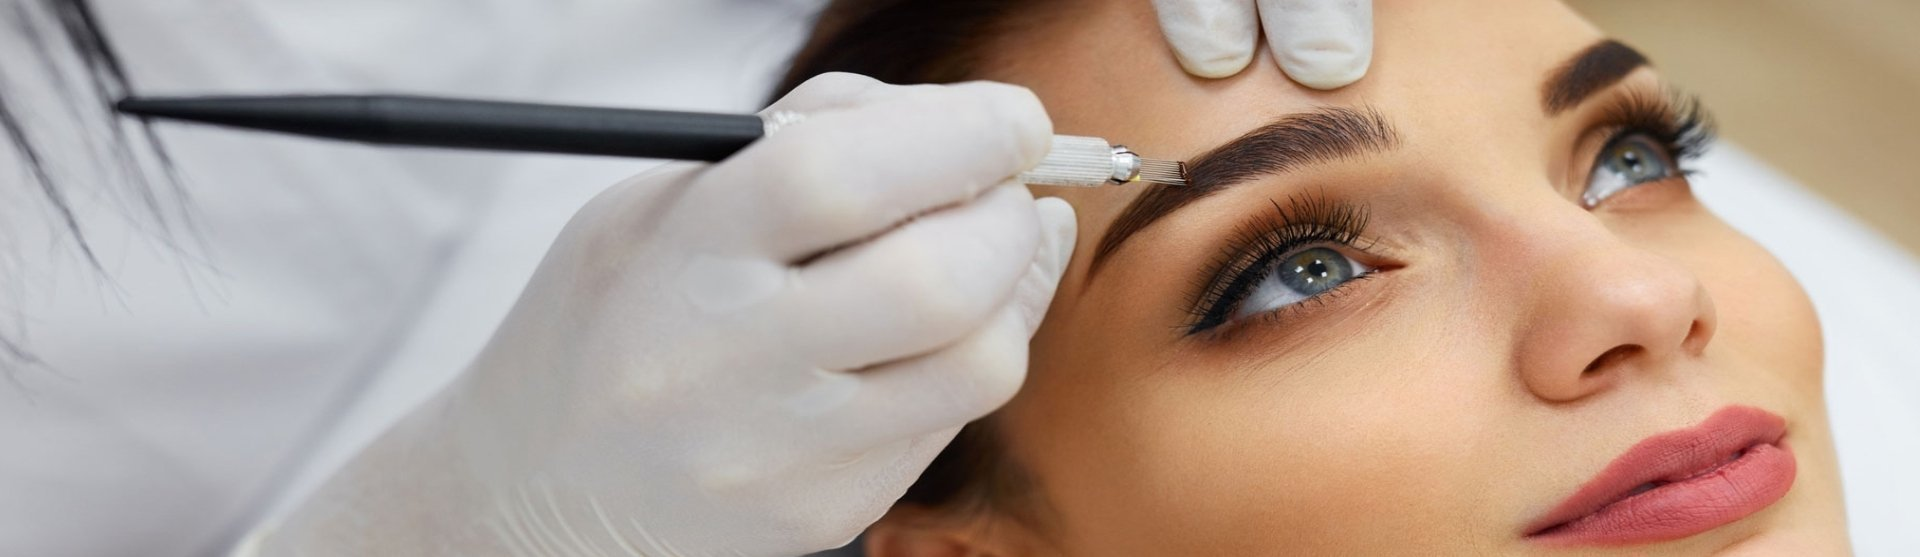 Microblading Zürich Hair Removal